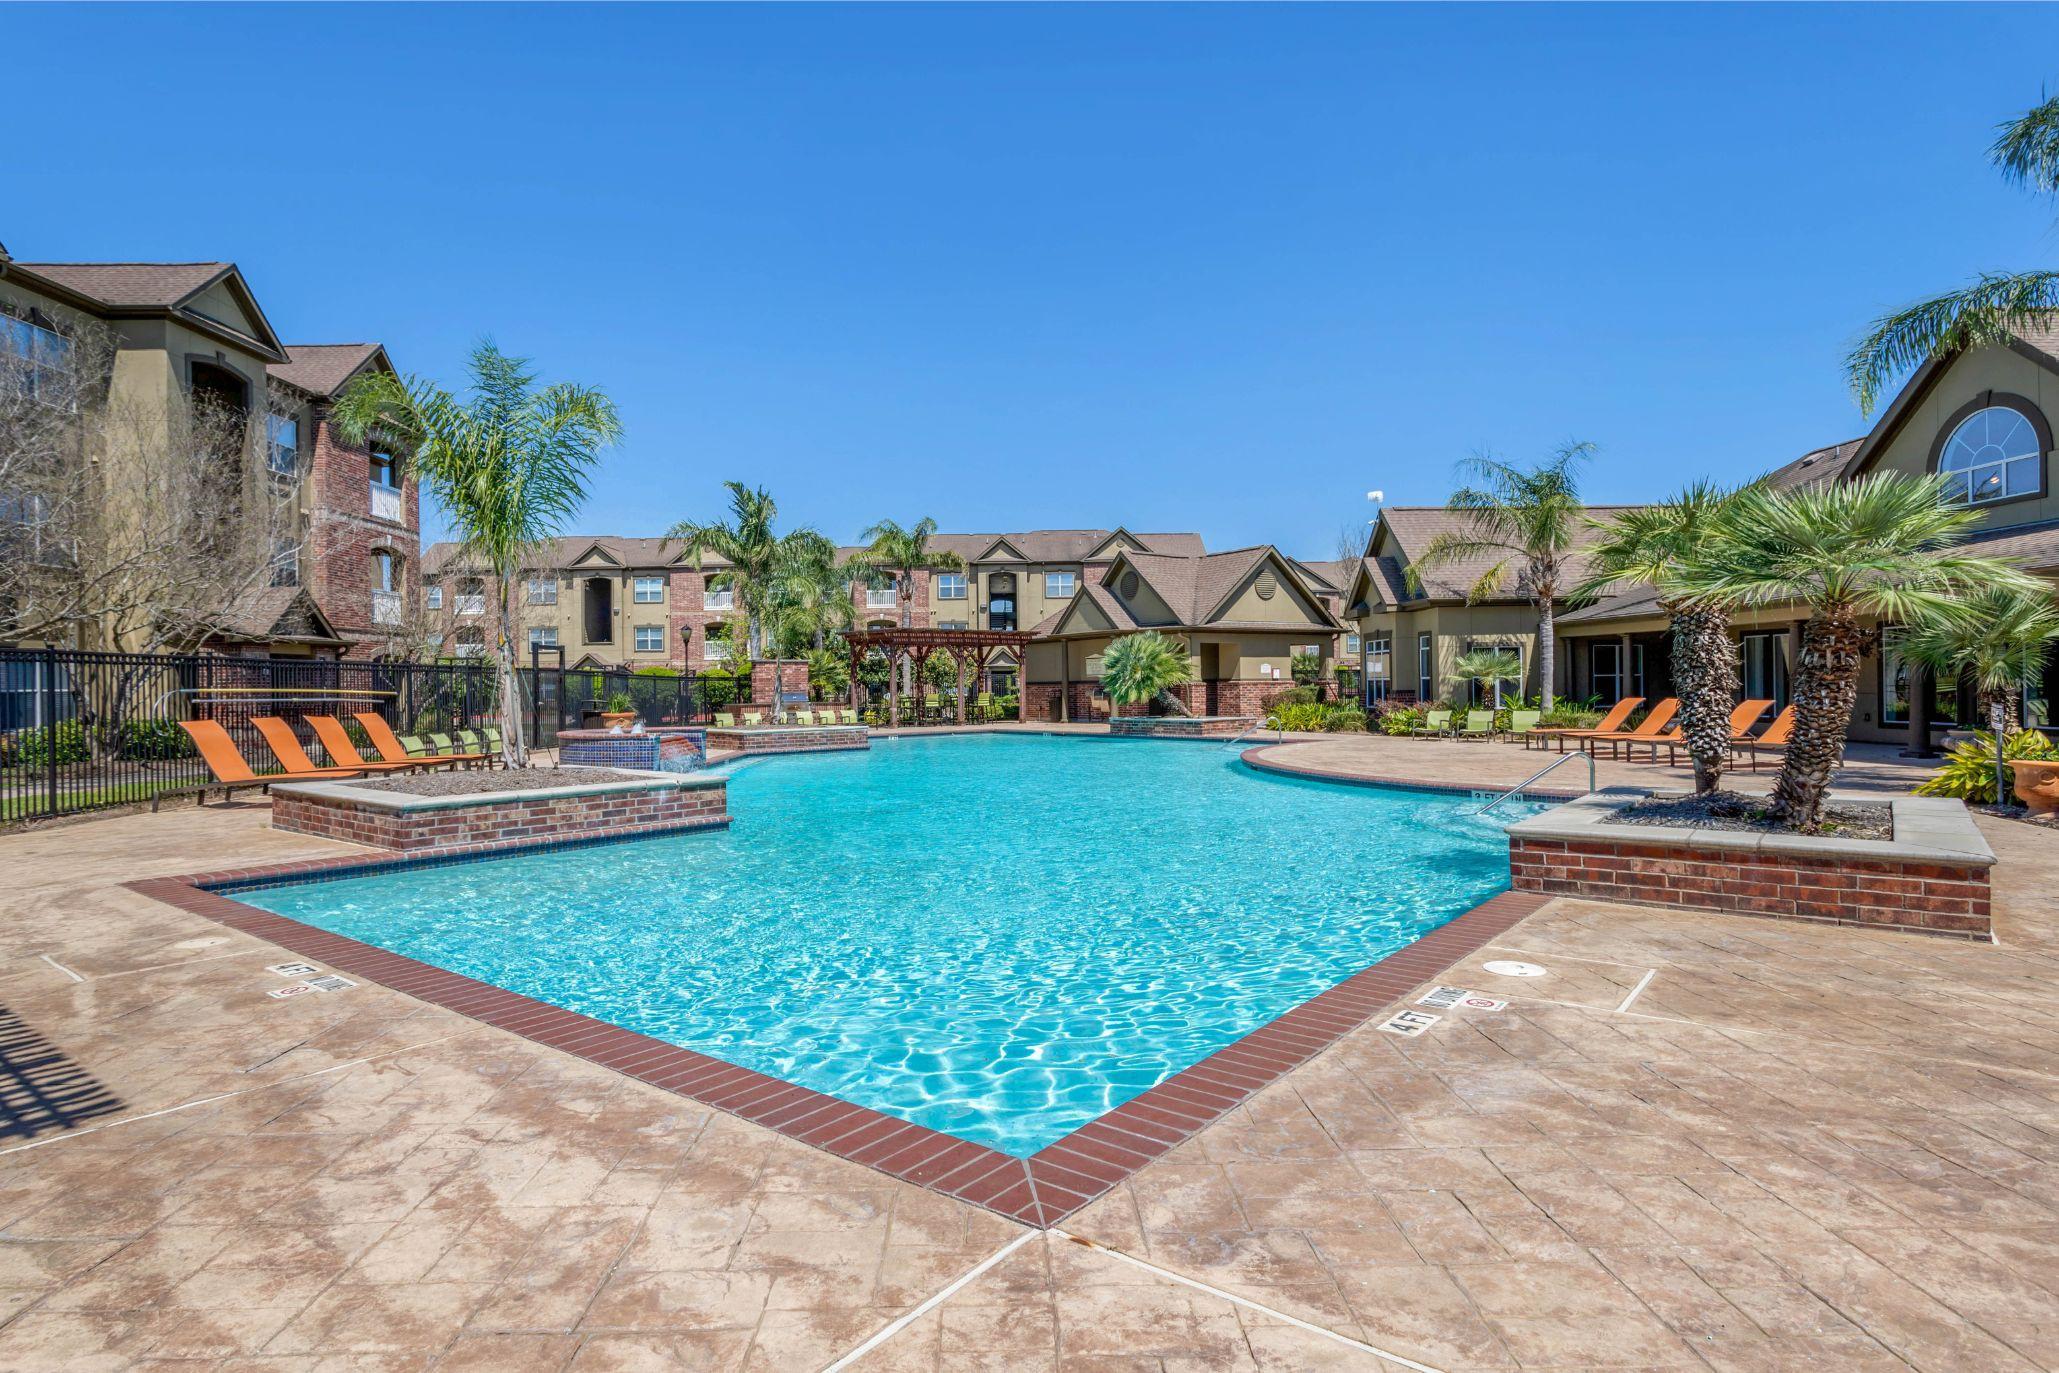 The Villas at Shadow Creek Apartments rental